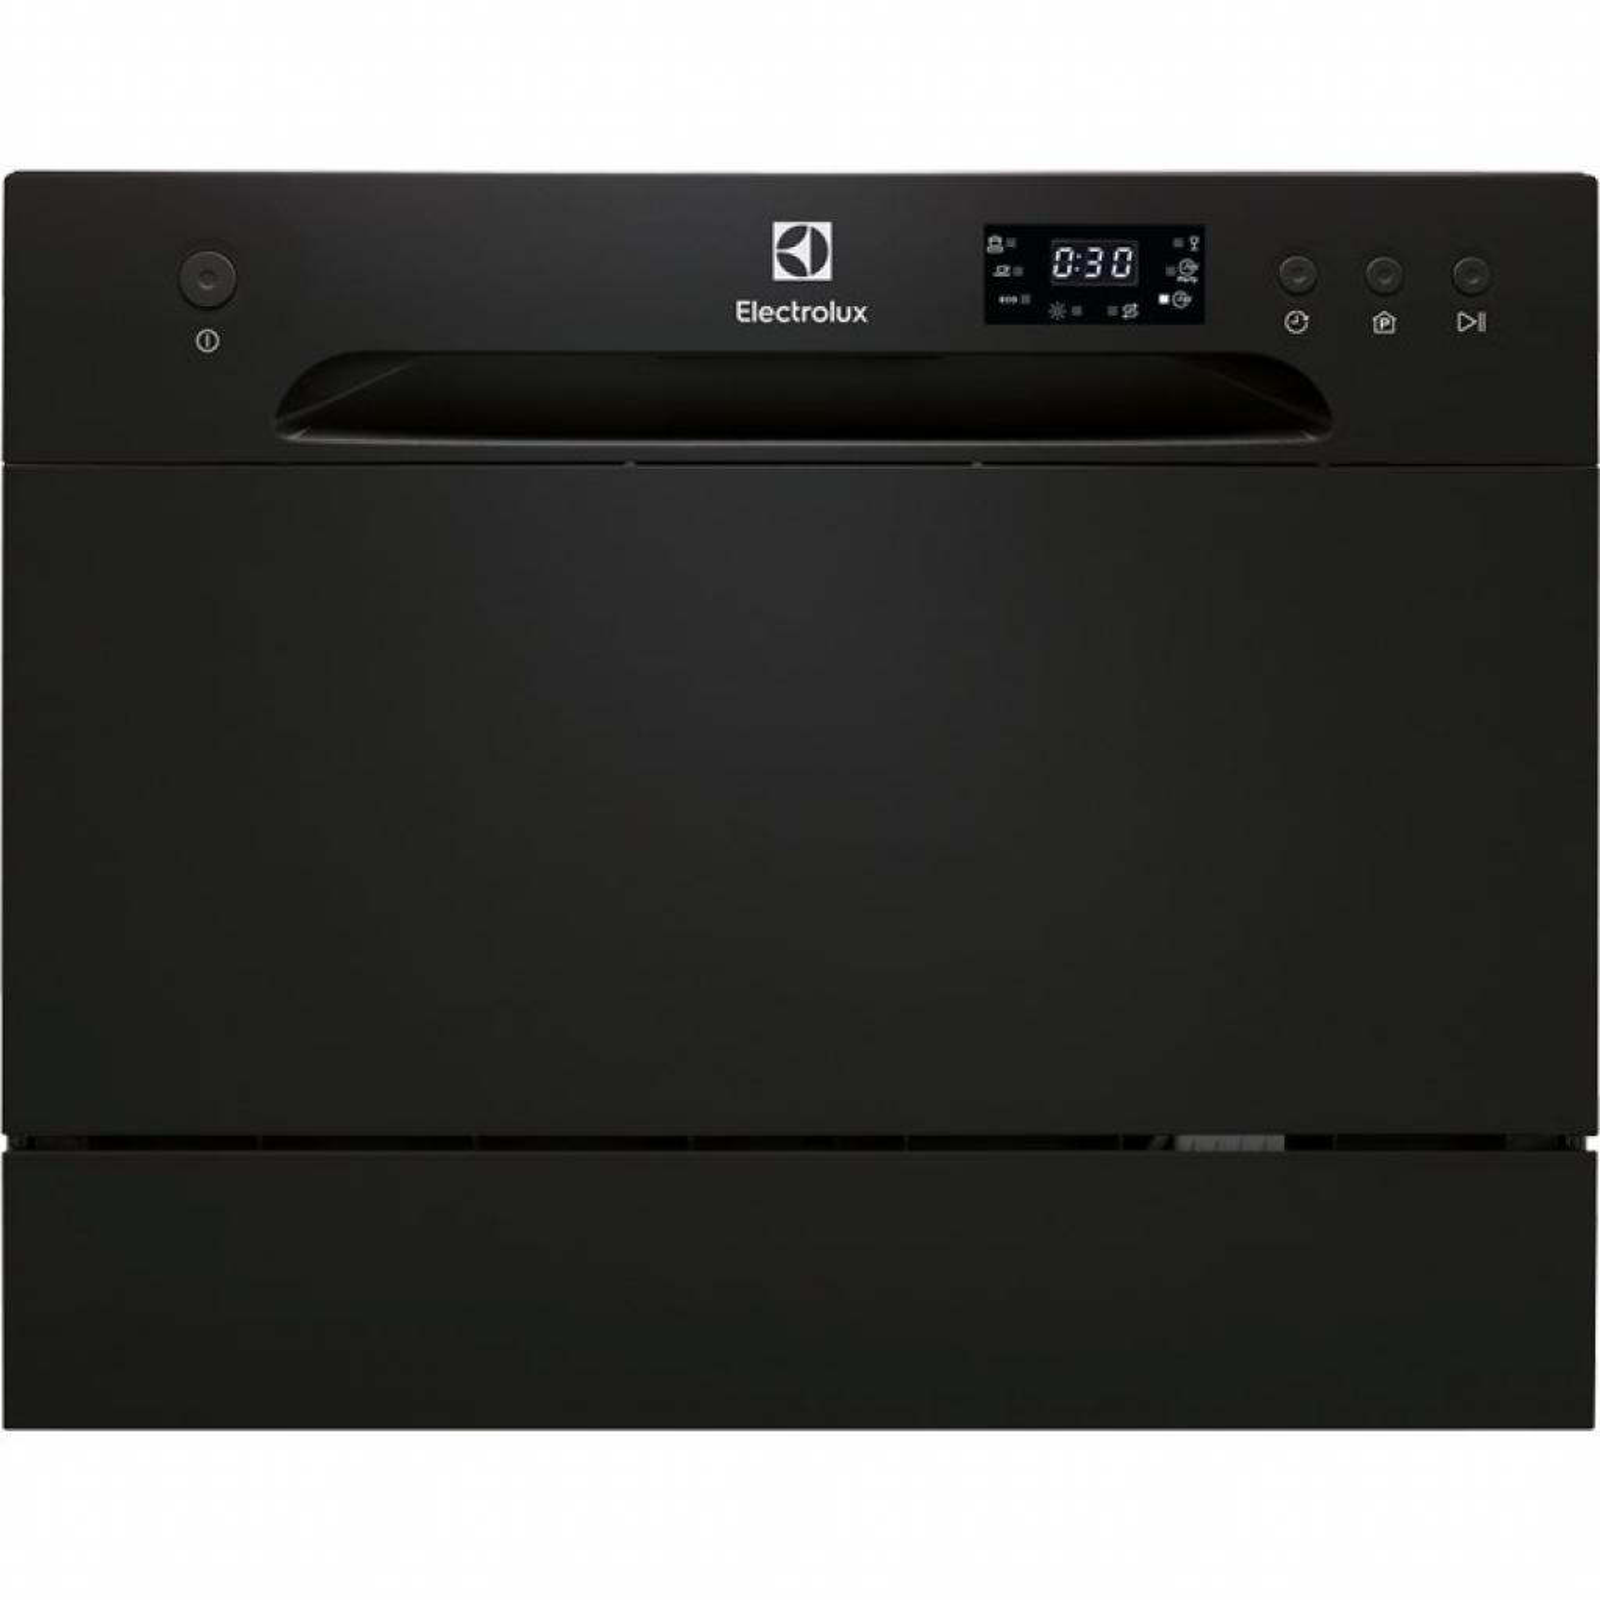 Посудомоечная машина ELECTROLUX ESF 2400O K (ESF2400OK)